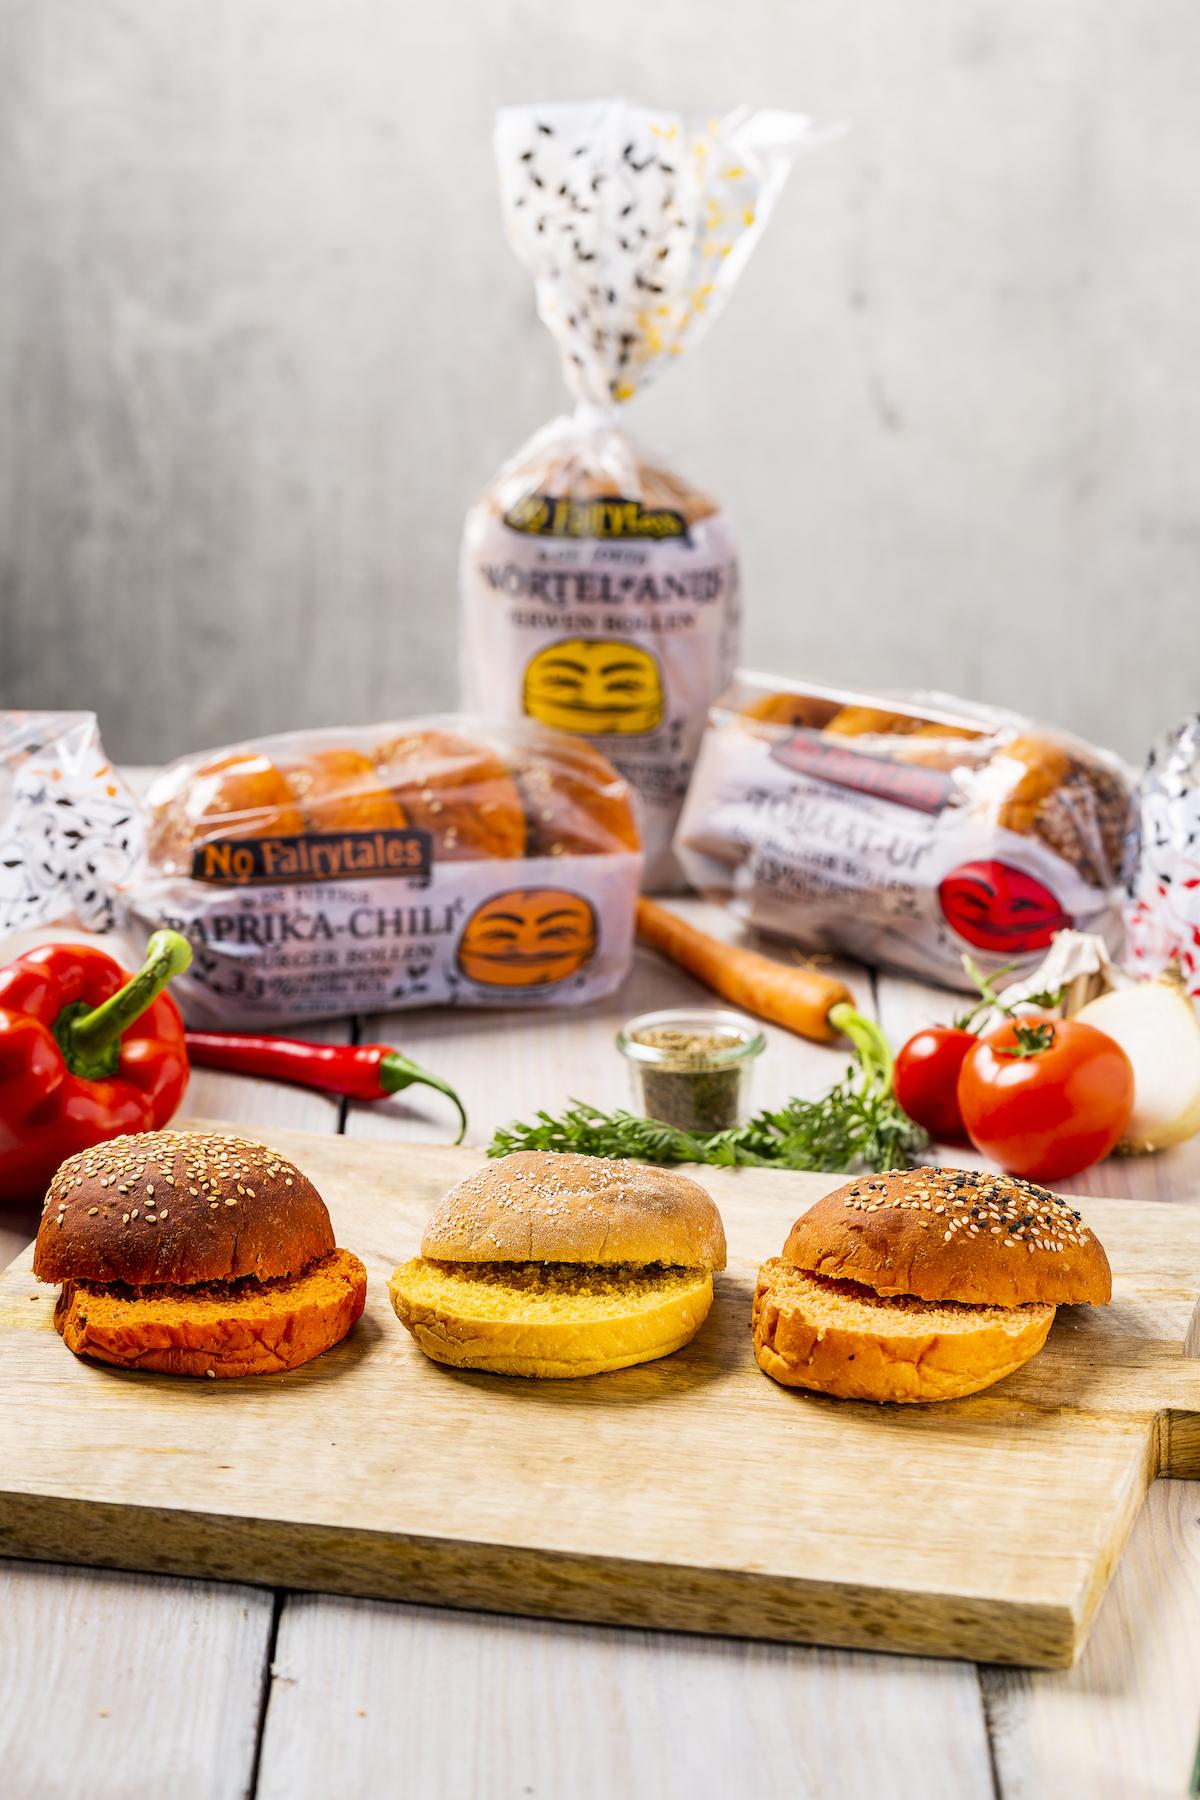 Gekleurde hamburgerbroodjes met groenten